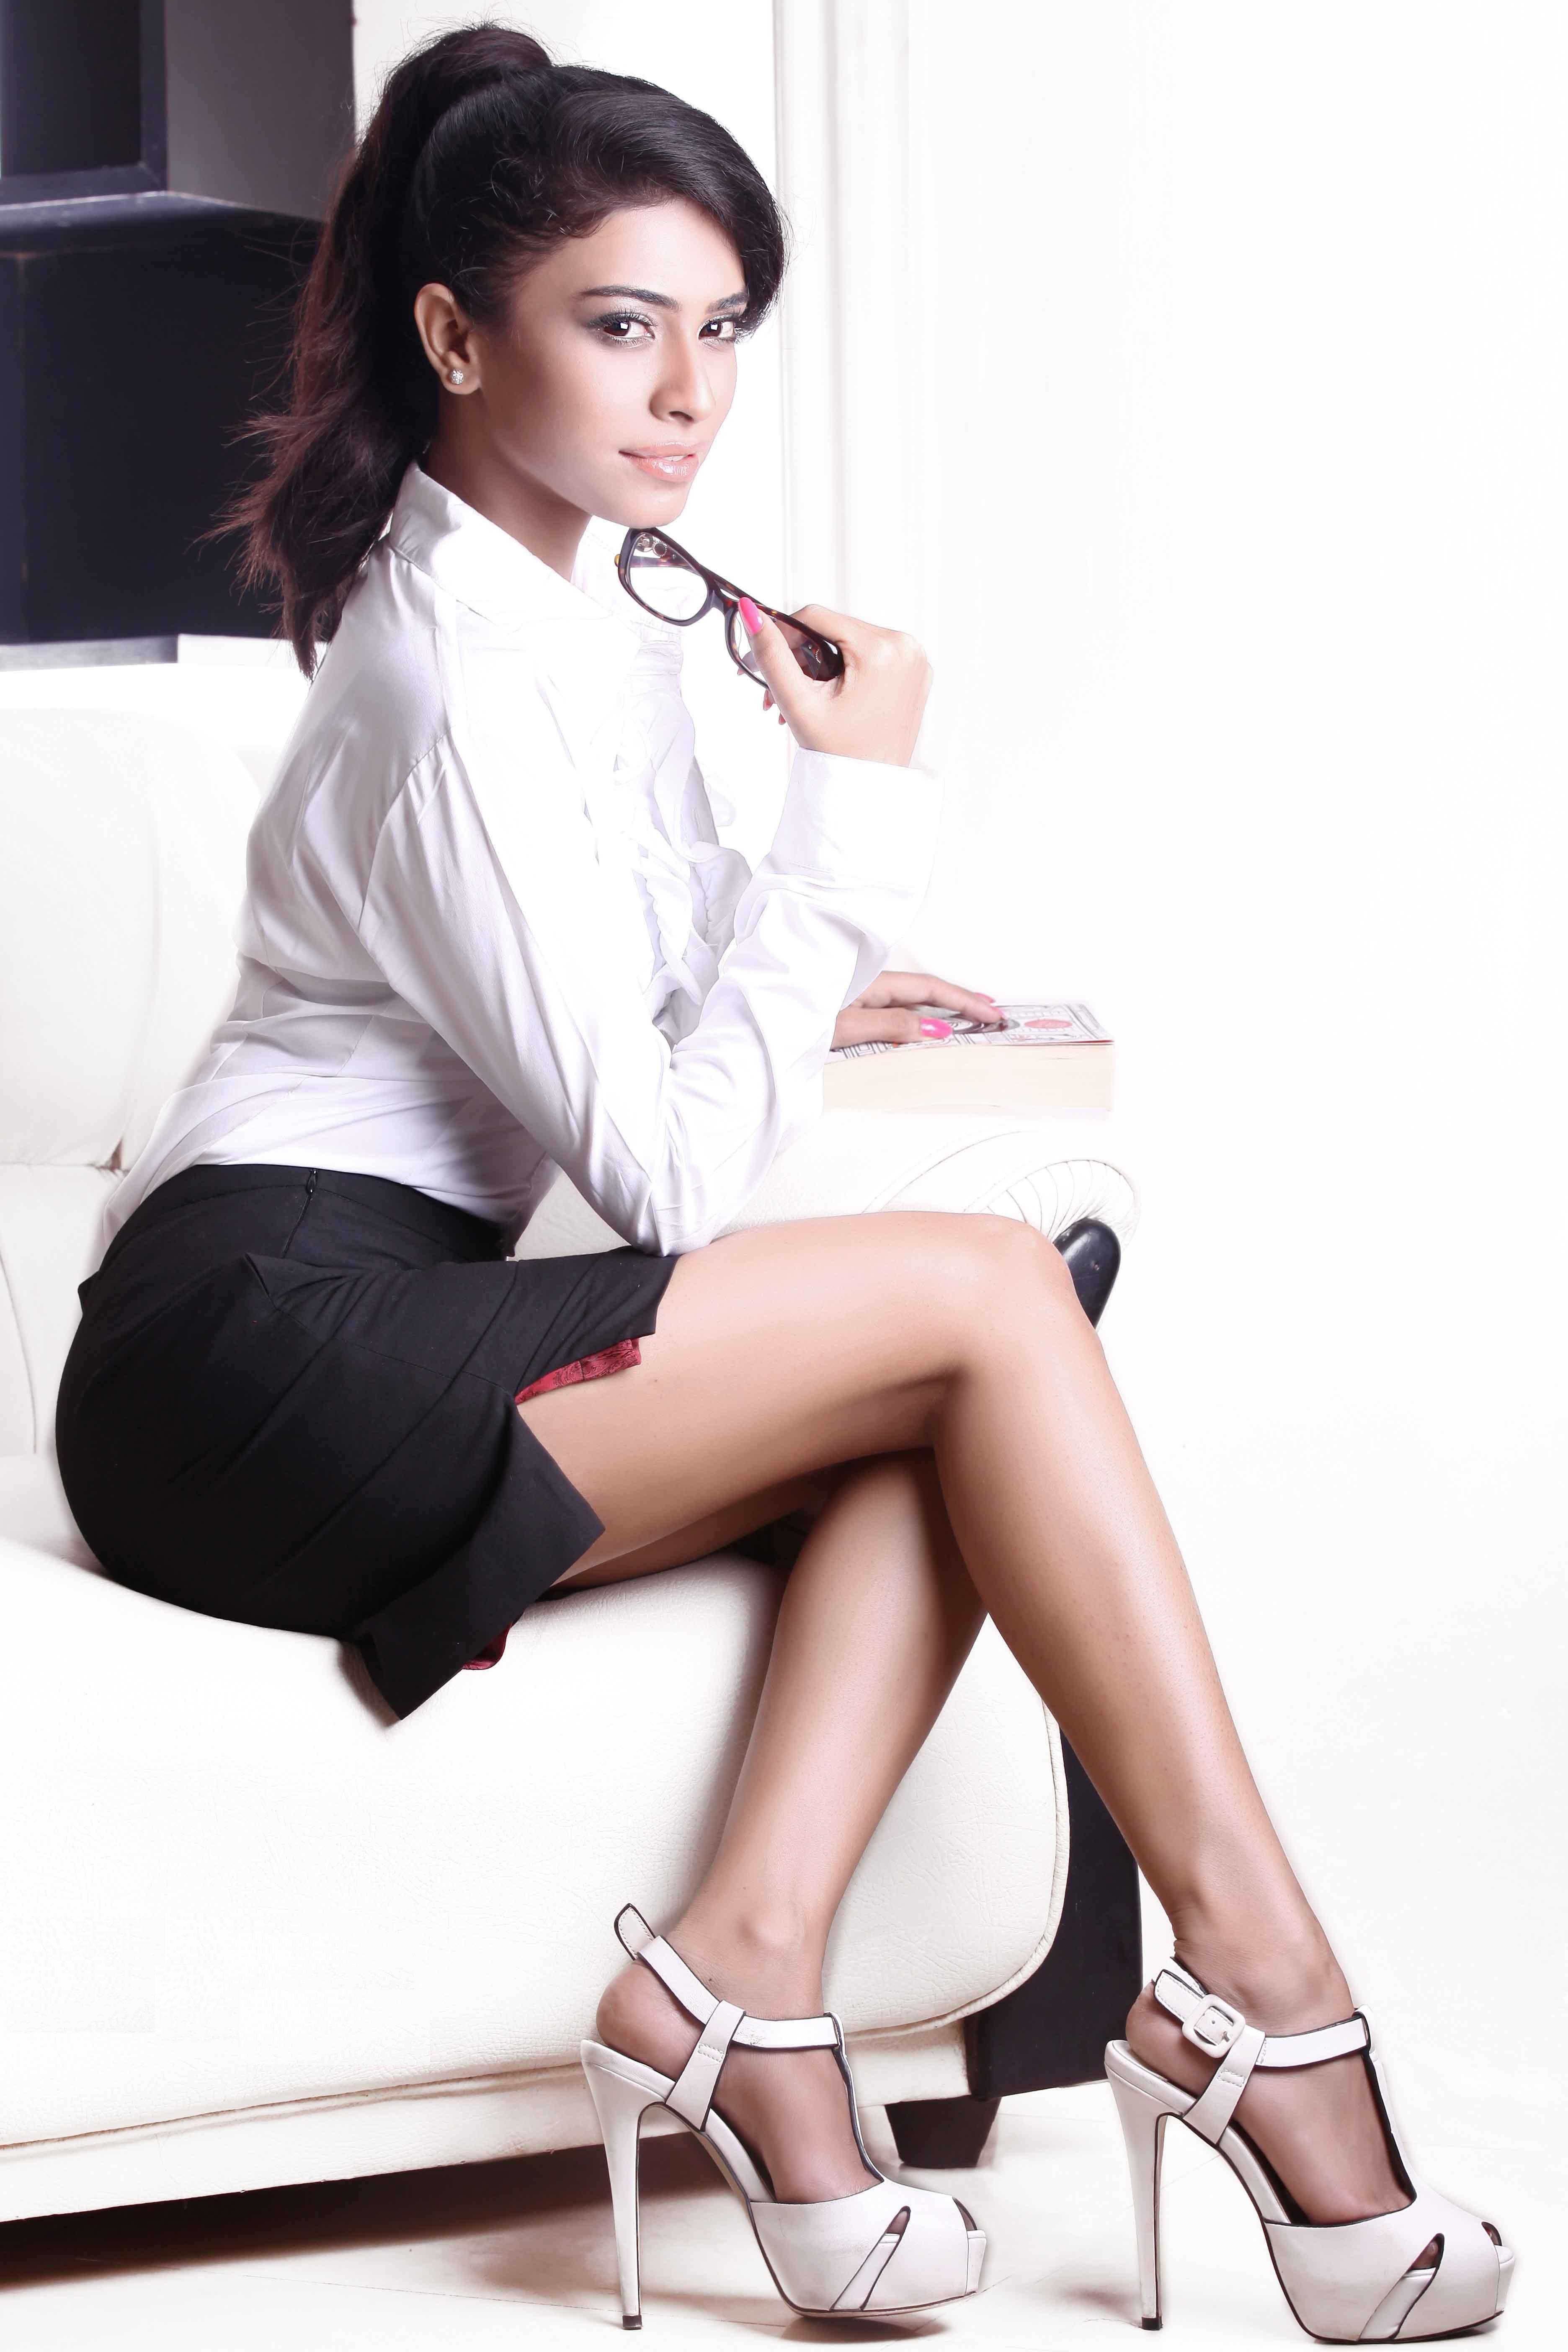 Rina Charaniya hot photos in lingerie